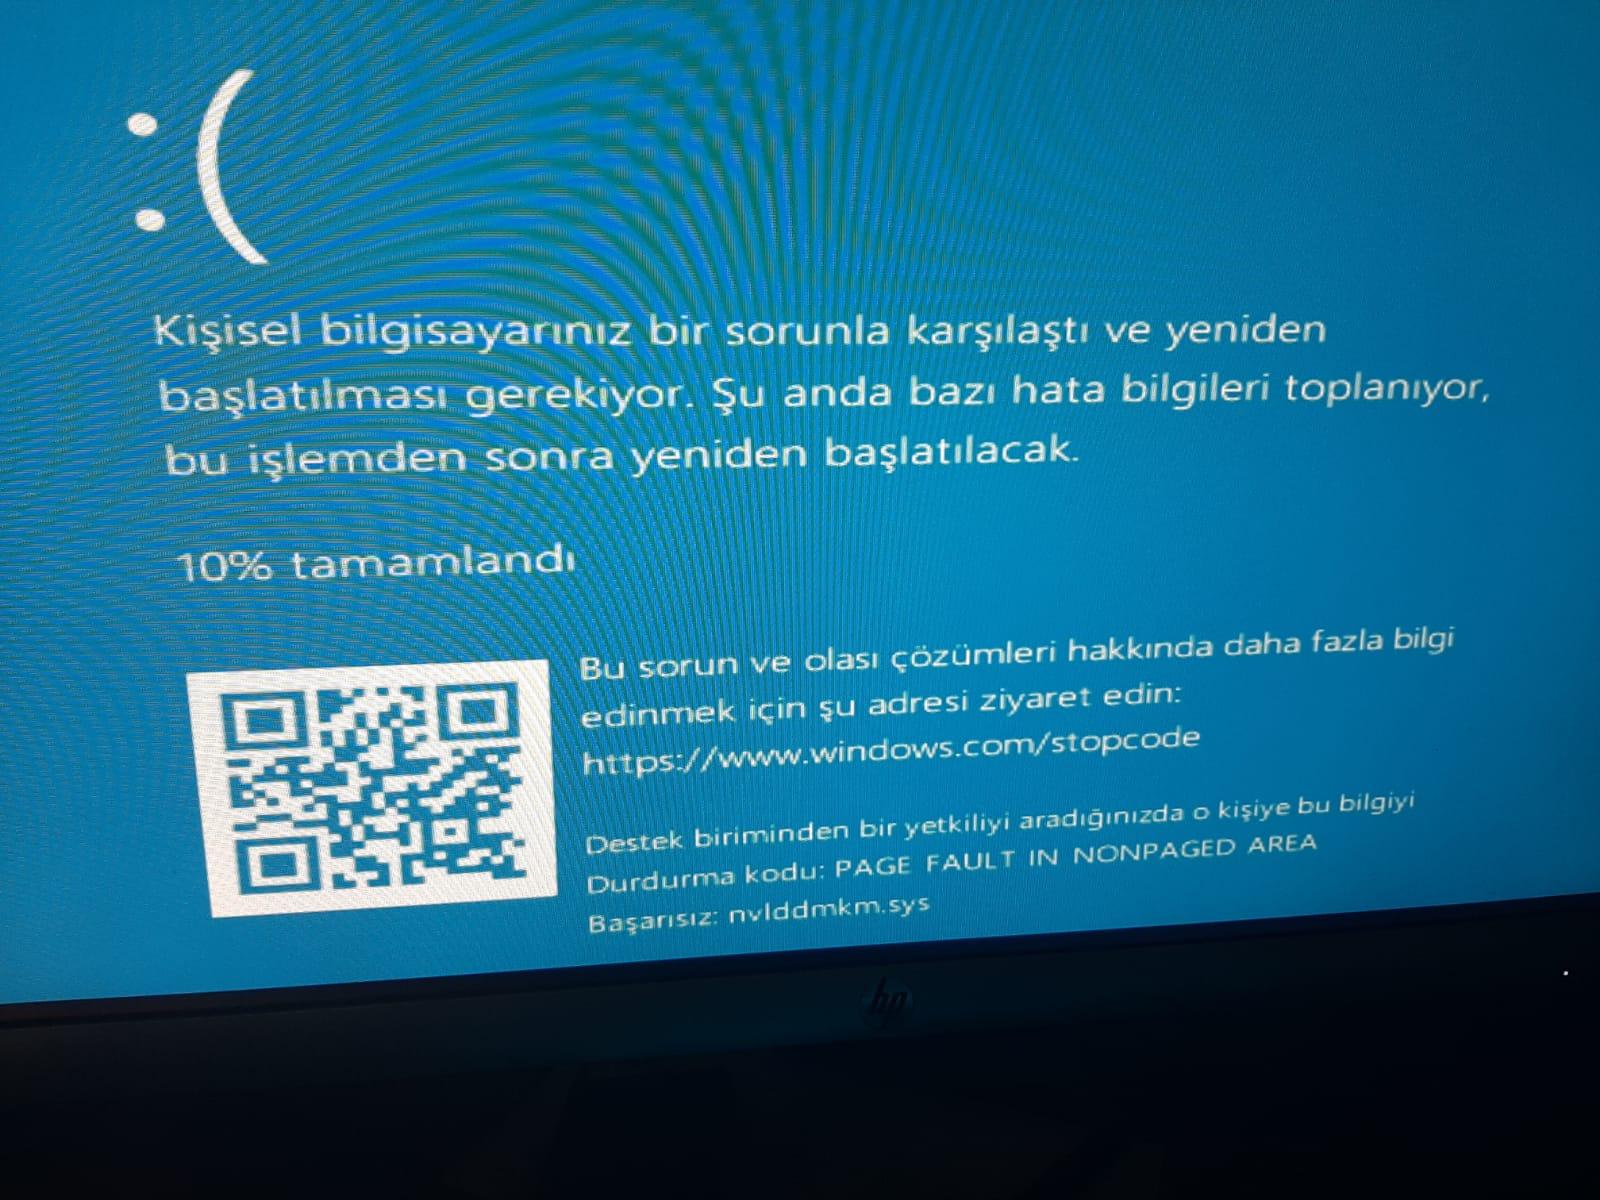 nvlddmkm.sys Blue Screen error 82b0fc9e-123b-406e-9f3f-b55f25ac0eaf?upload=true.jpg